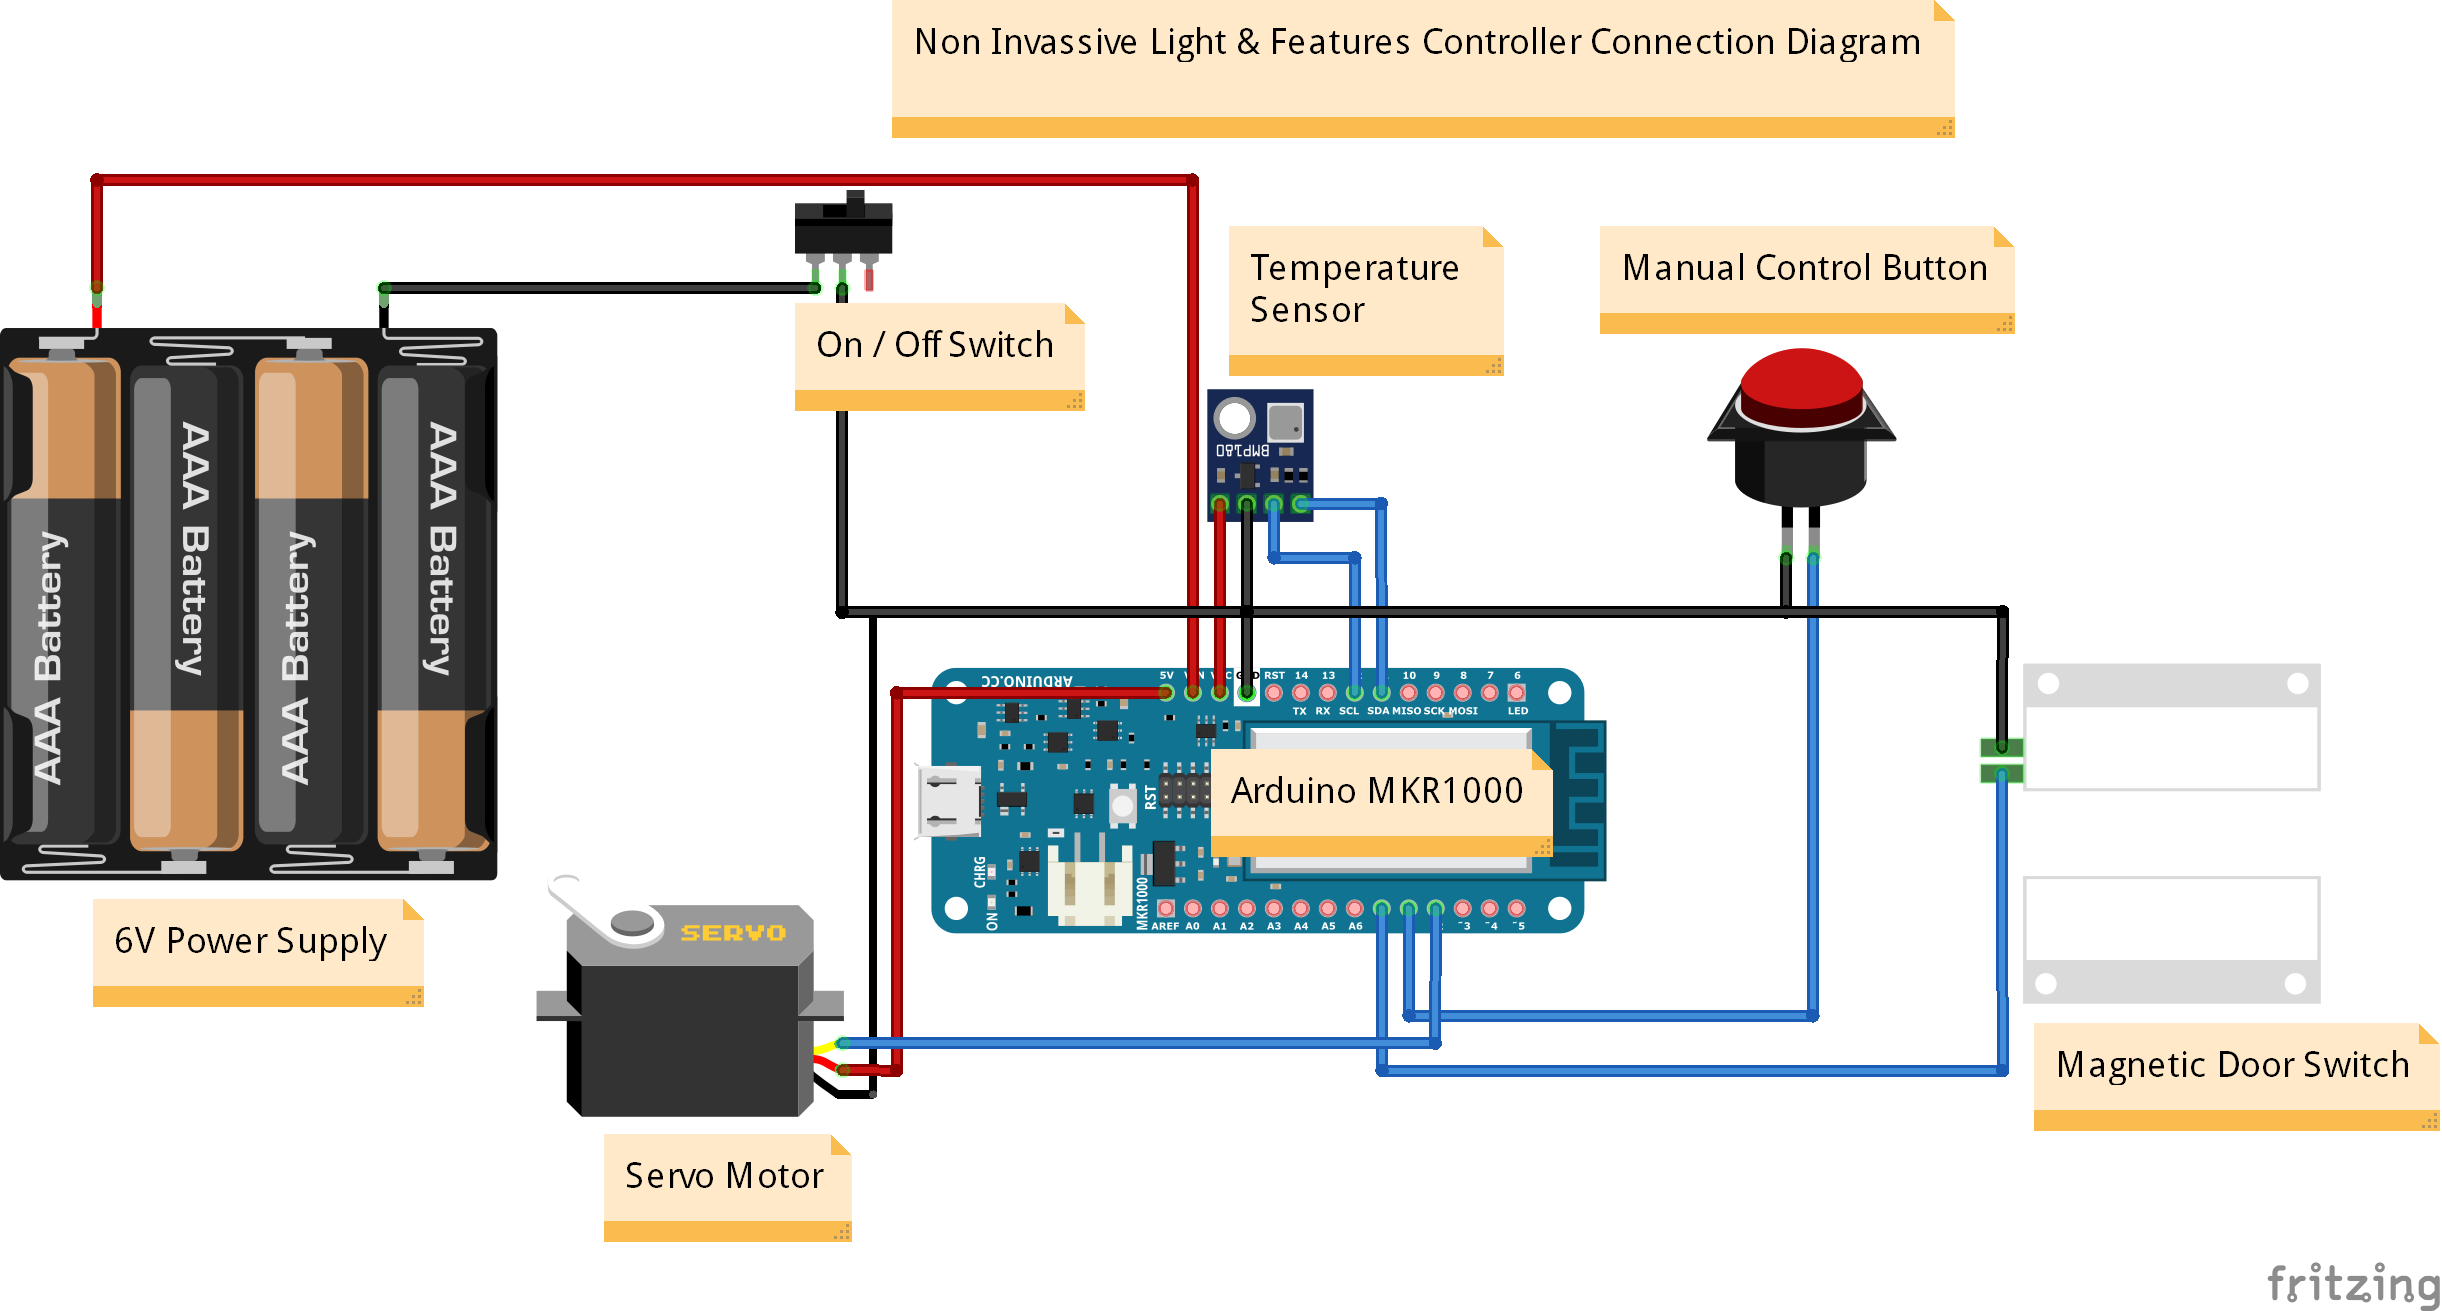 Noninvassivelightcontroller bb ka8rx2omil